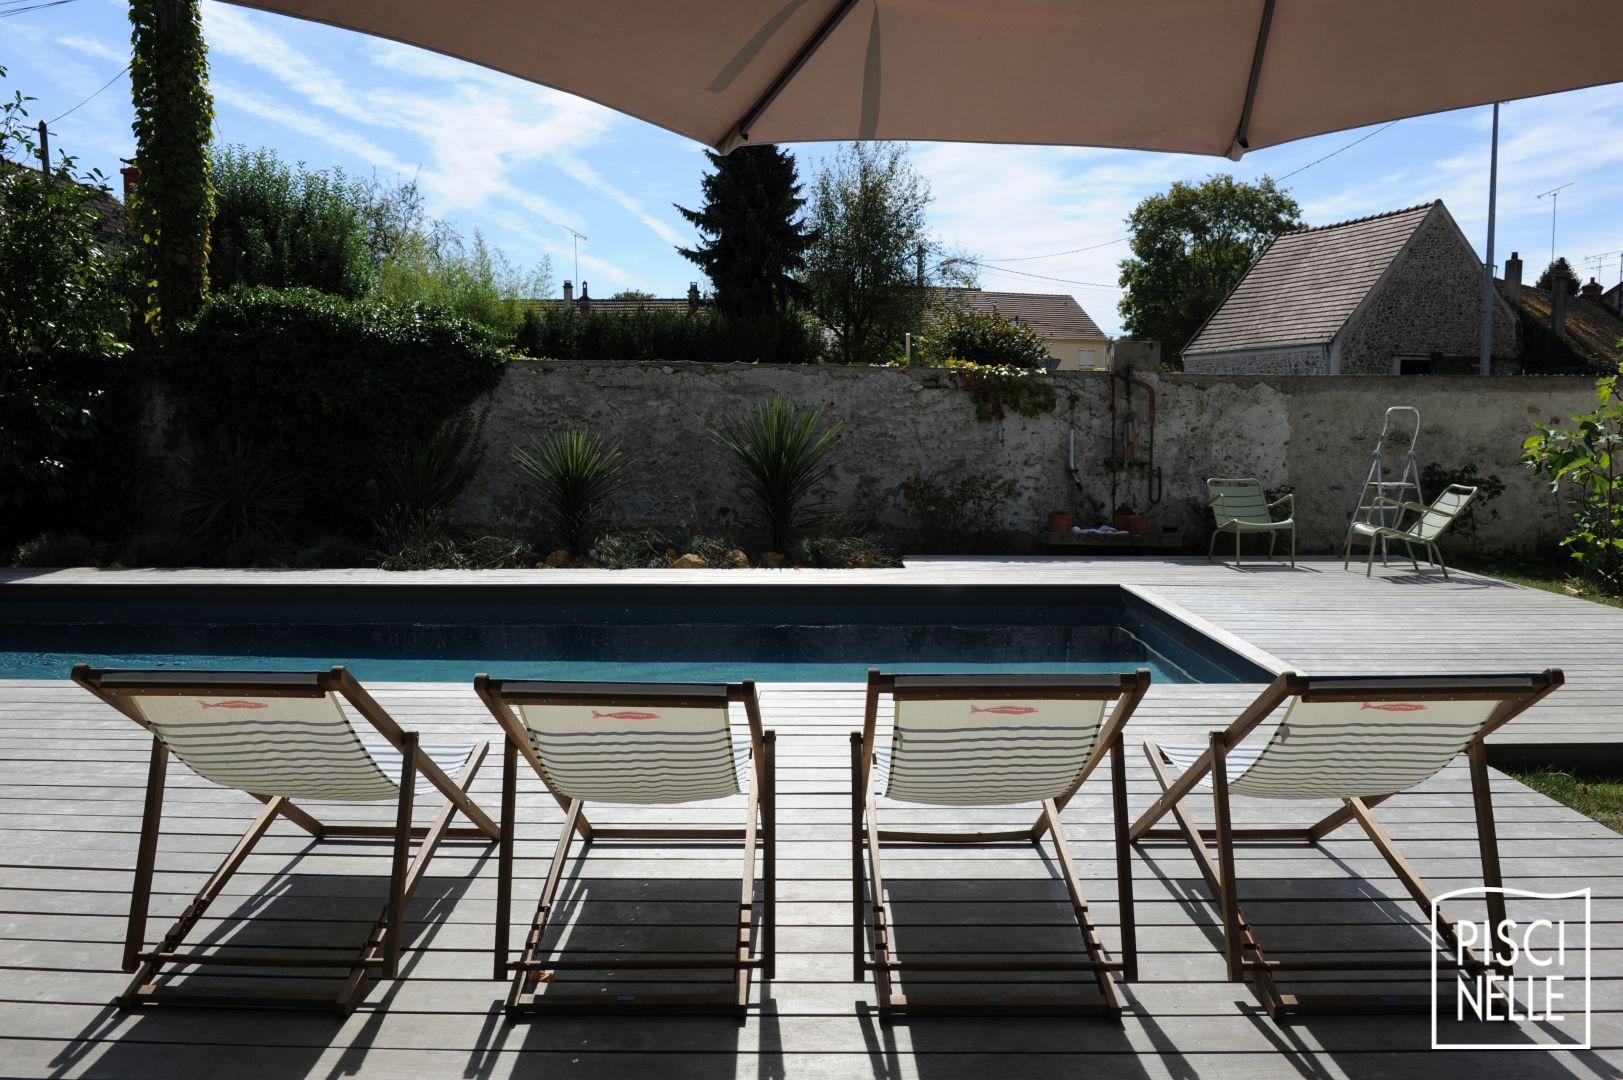 Transat piscine design cool merveilleux transat de for Transat piscine pas cher